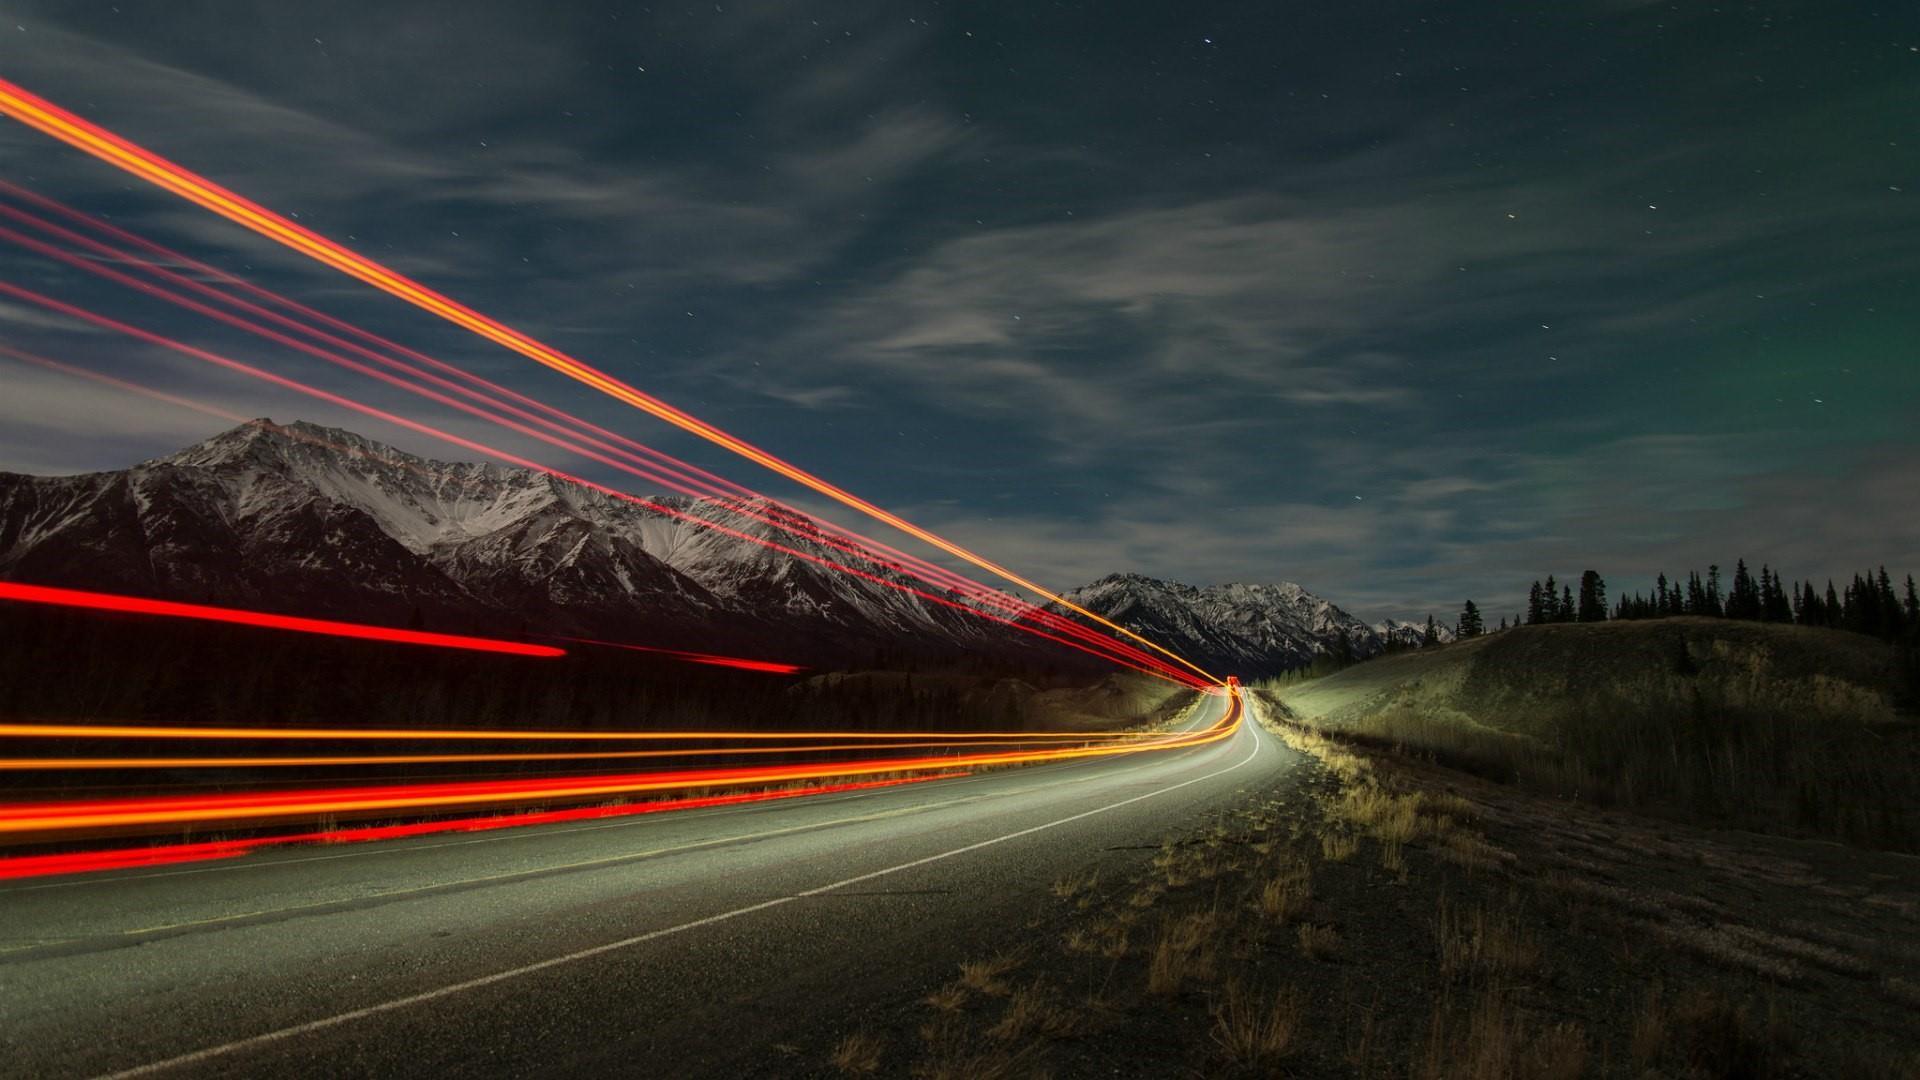 Traffic trail on the Alaska highway wallpaper